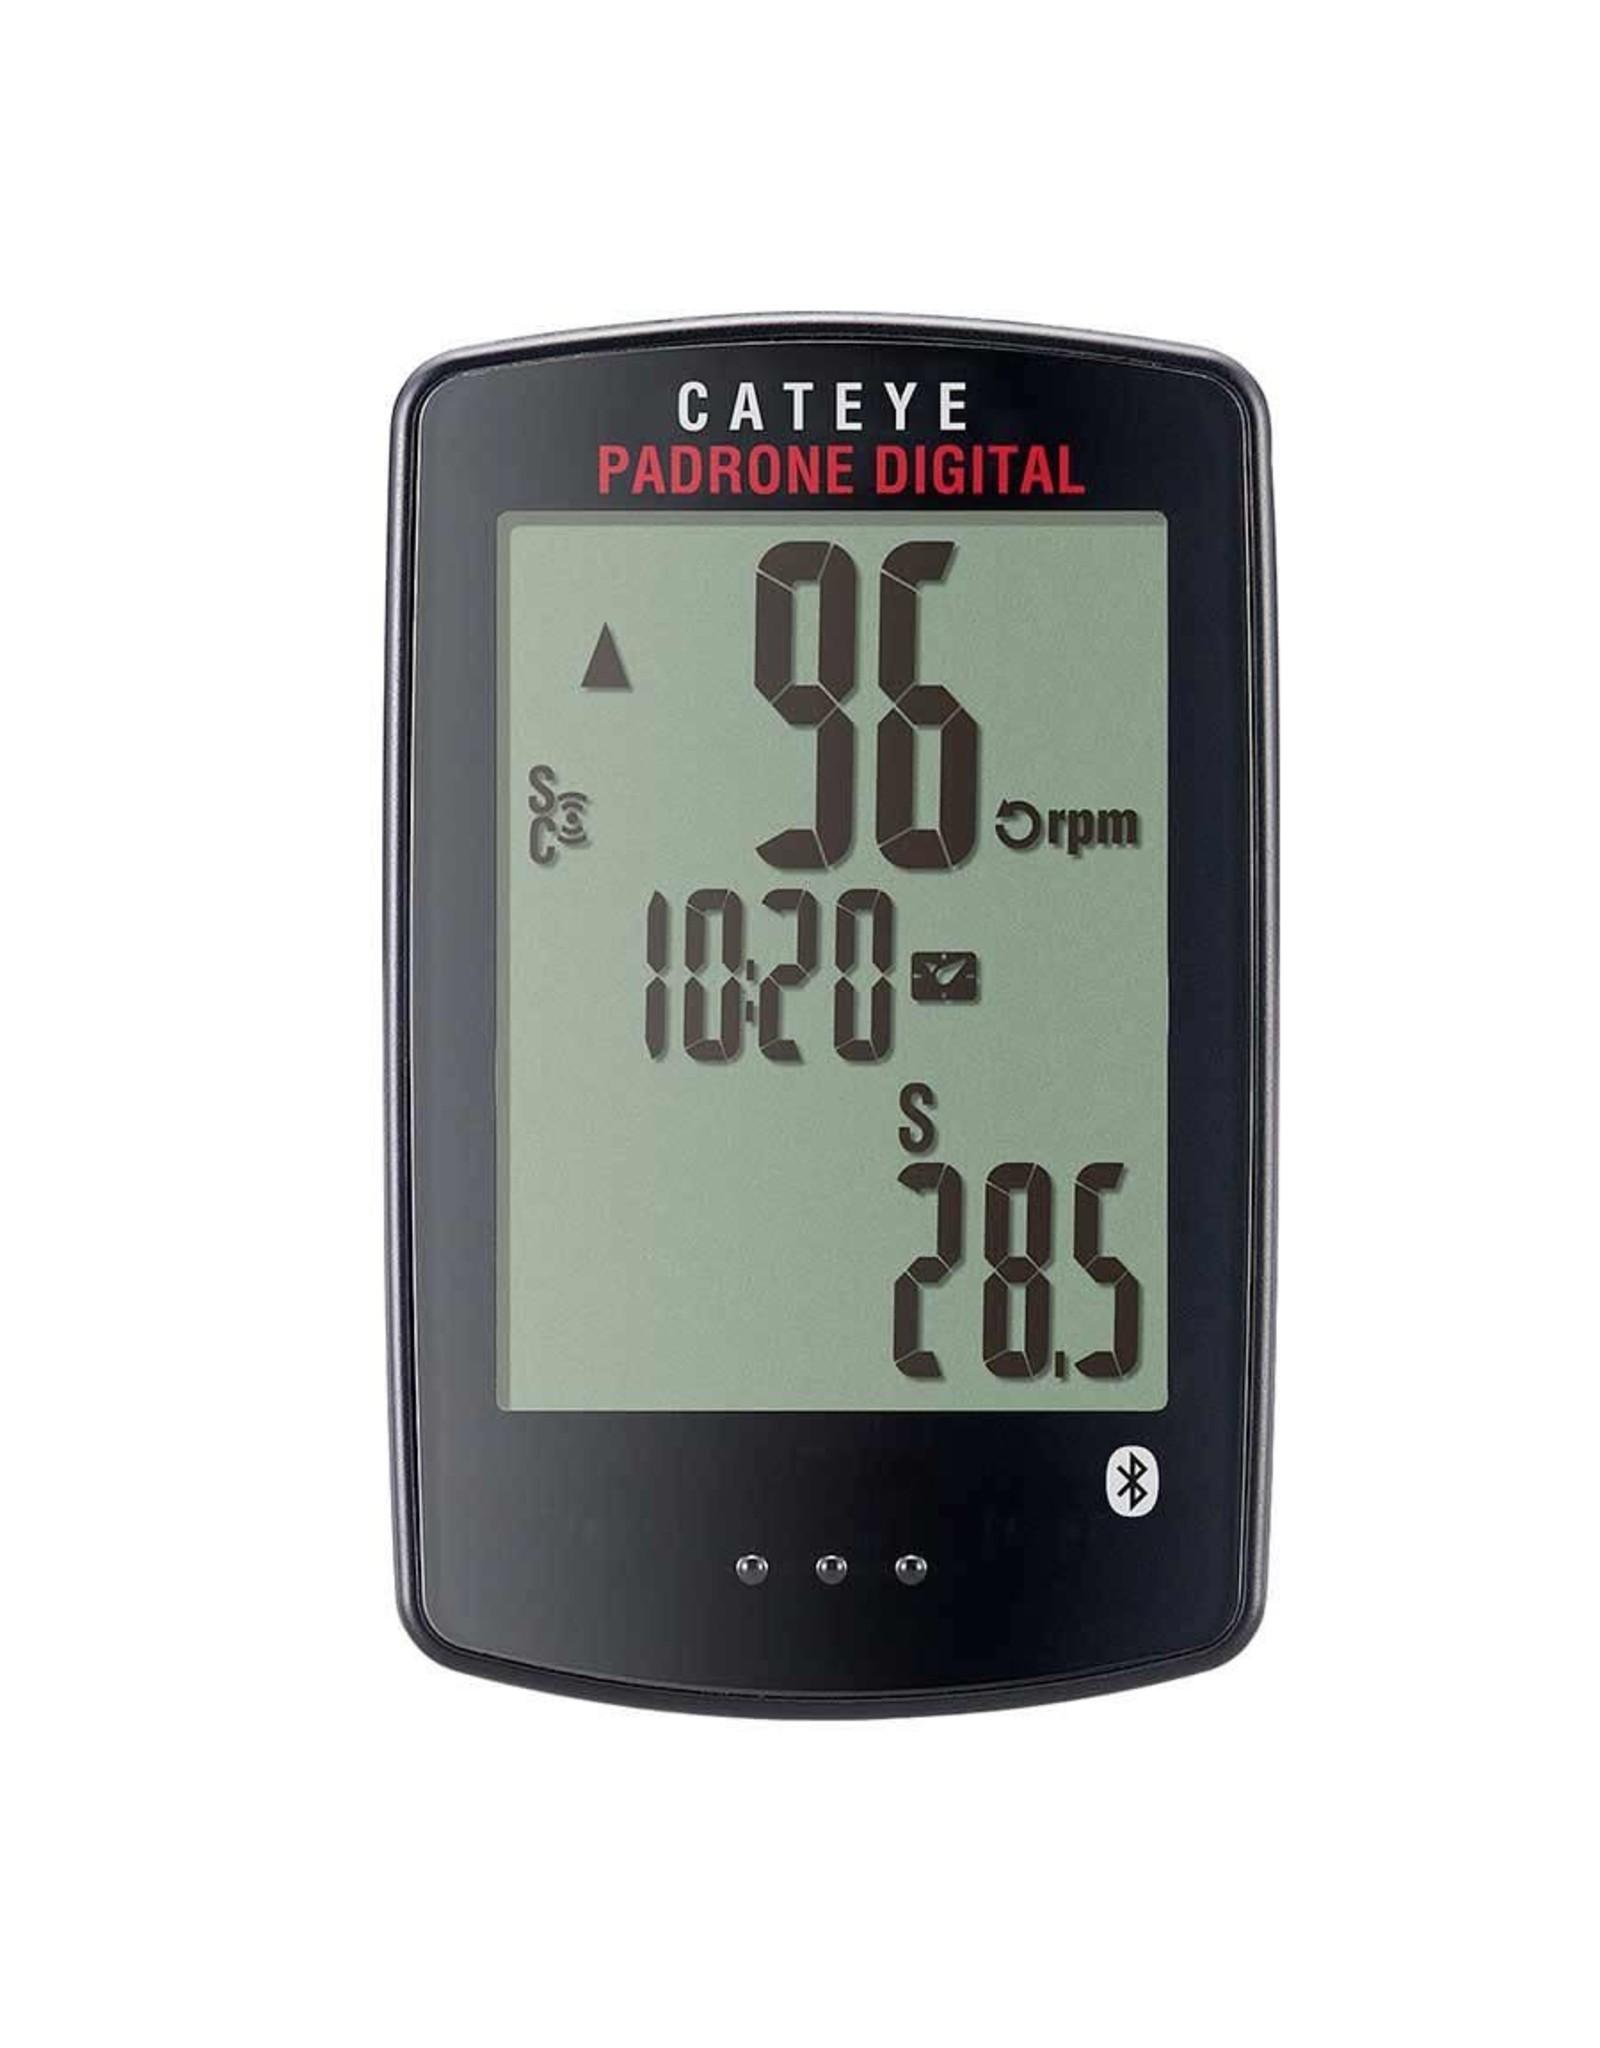 CatEye CatEye - Padrone Digital, Computer, GPS: No, HR: Optional, Cadence: Optional, Black